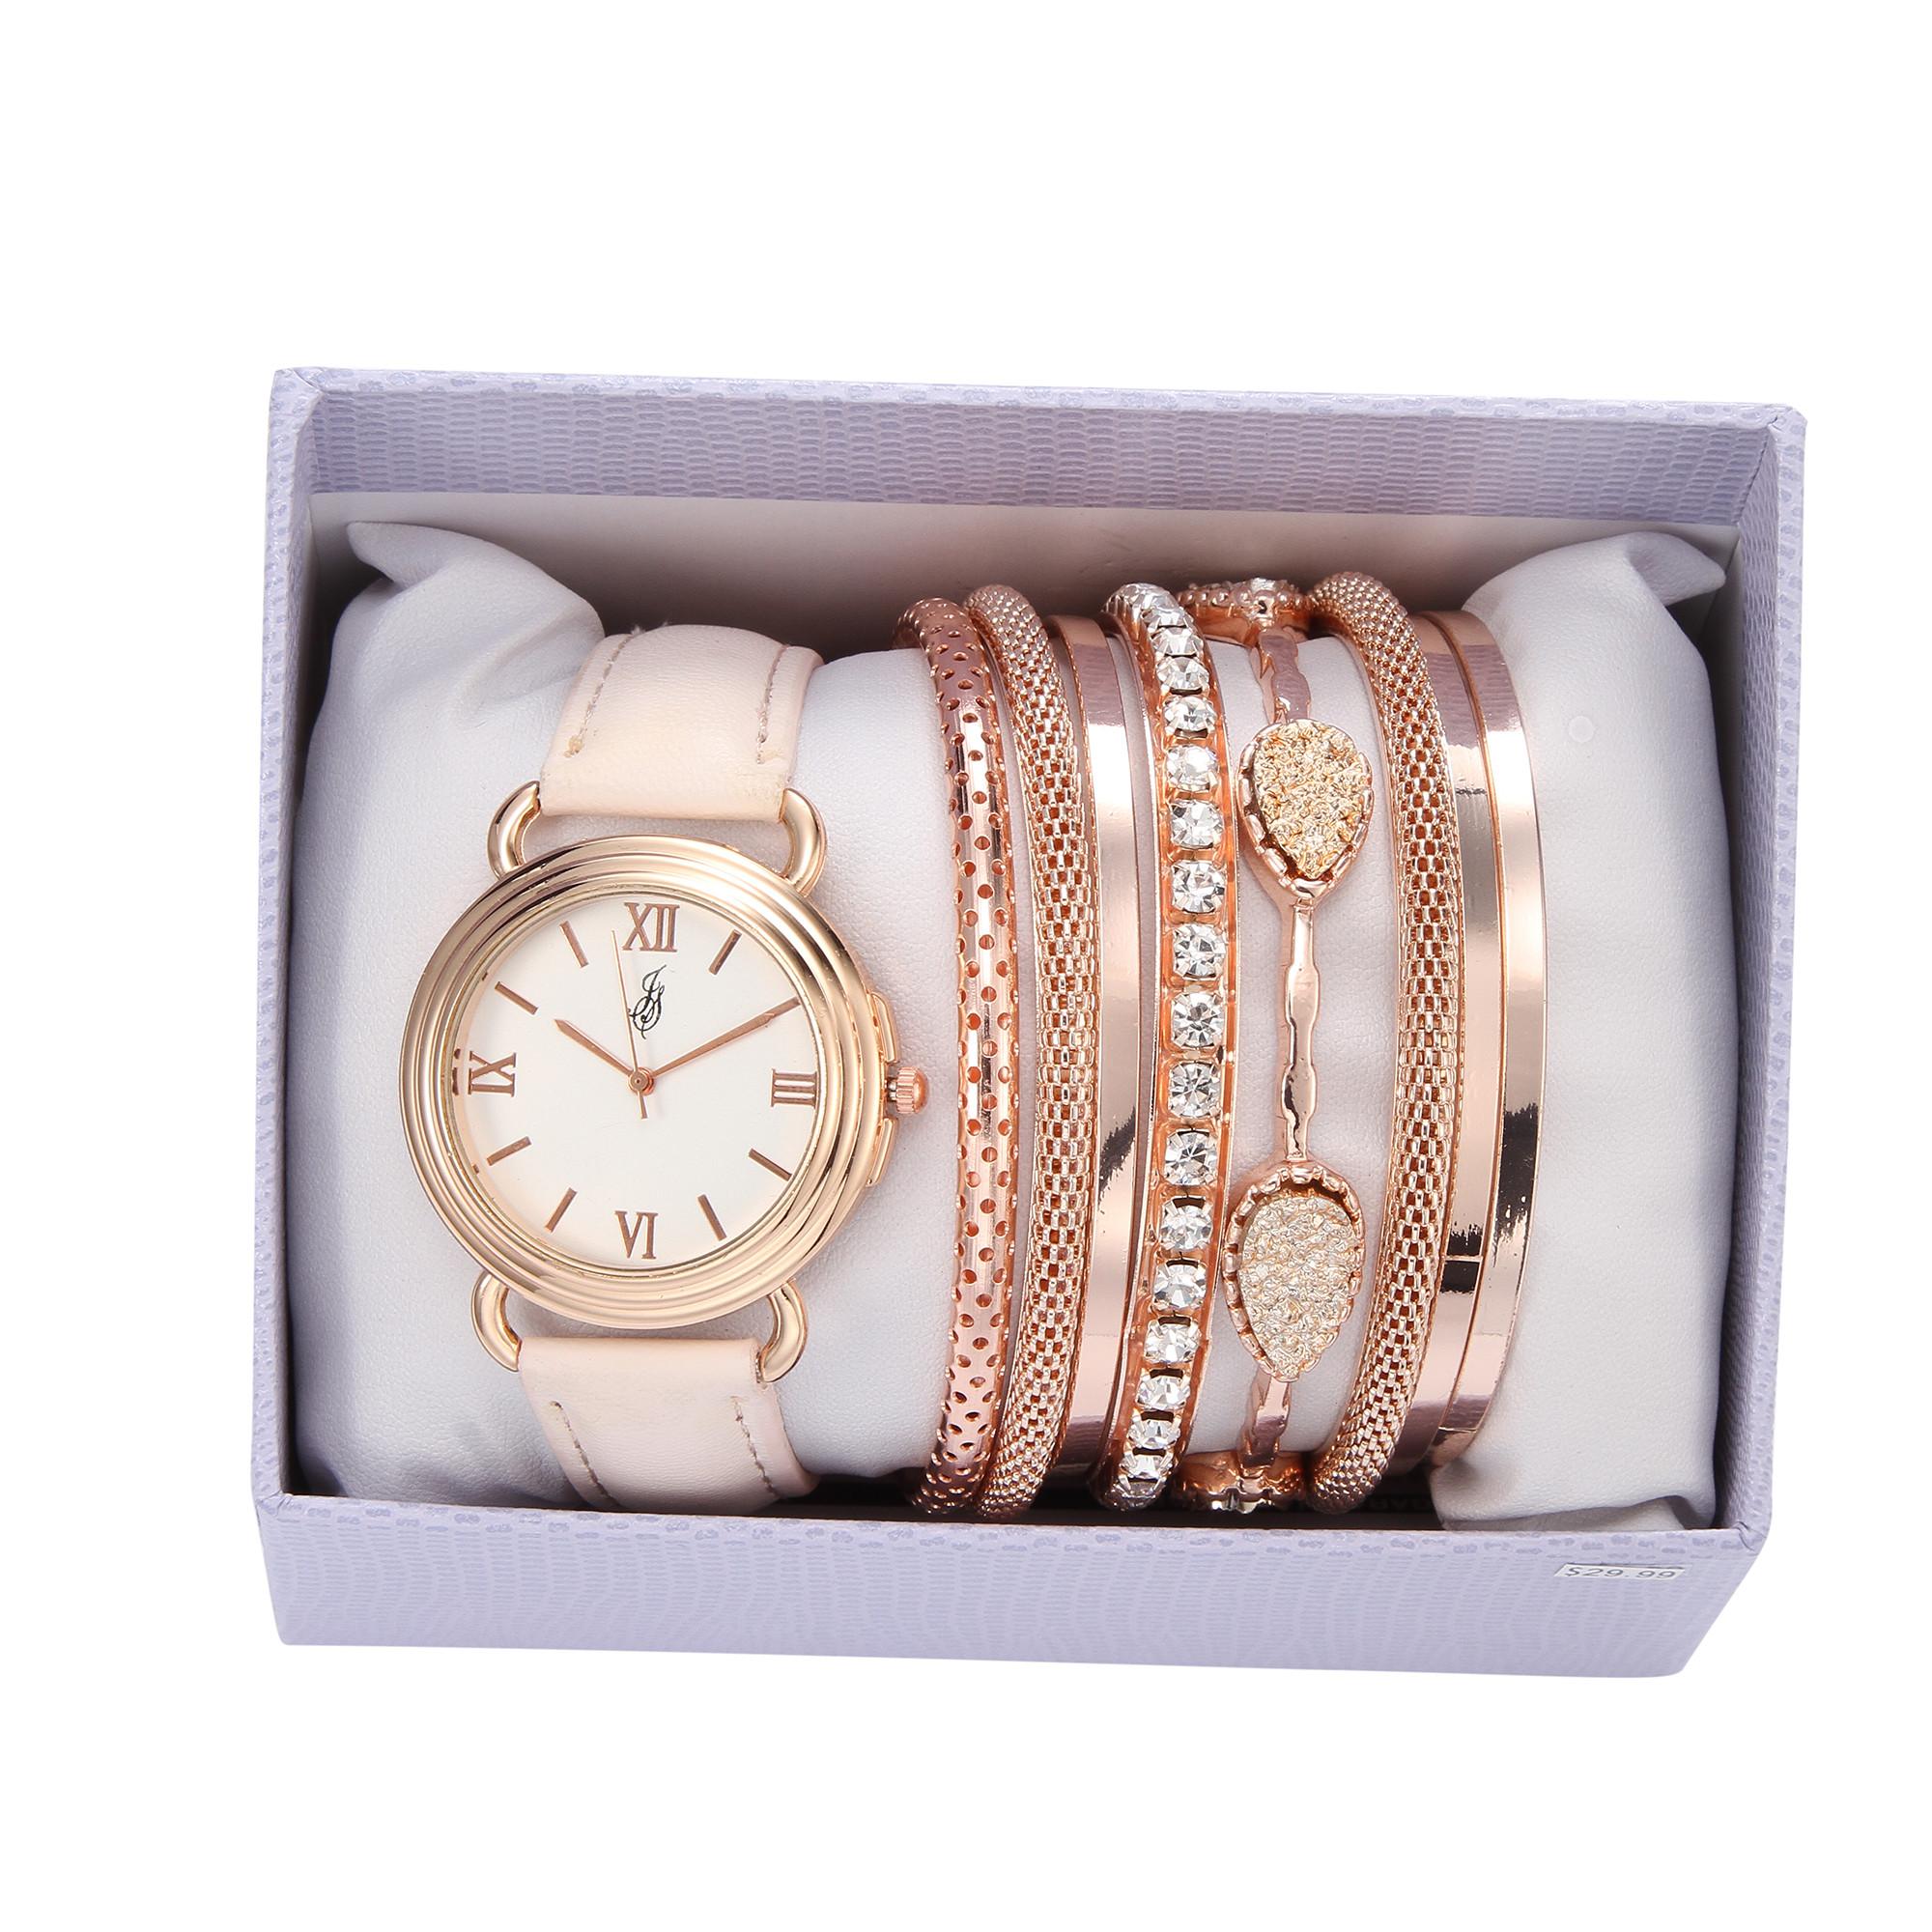 Bracelet And Watch Set  Laura Scott La s Rose Gold Blush Leather Strap Bracelet